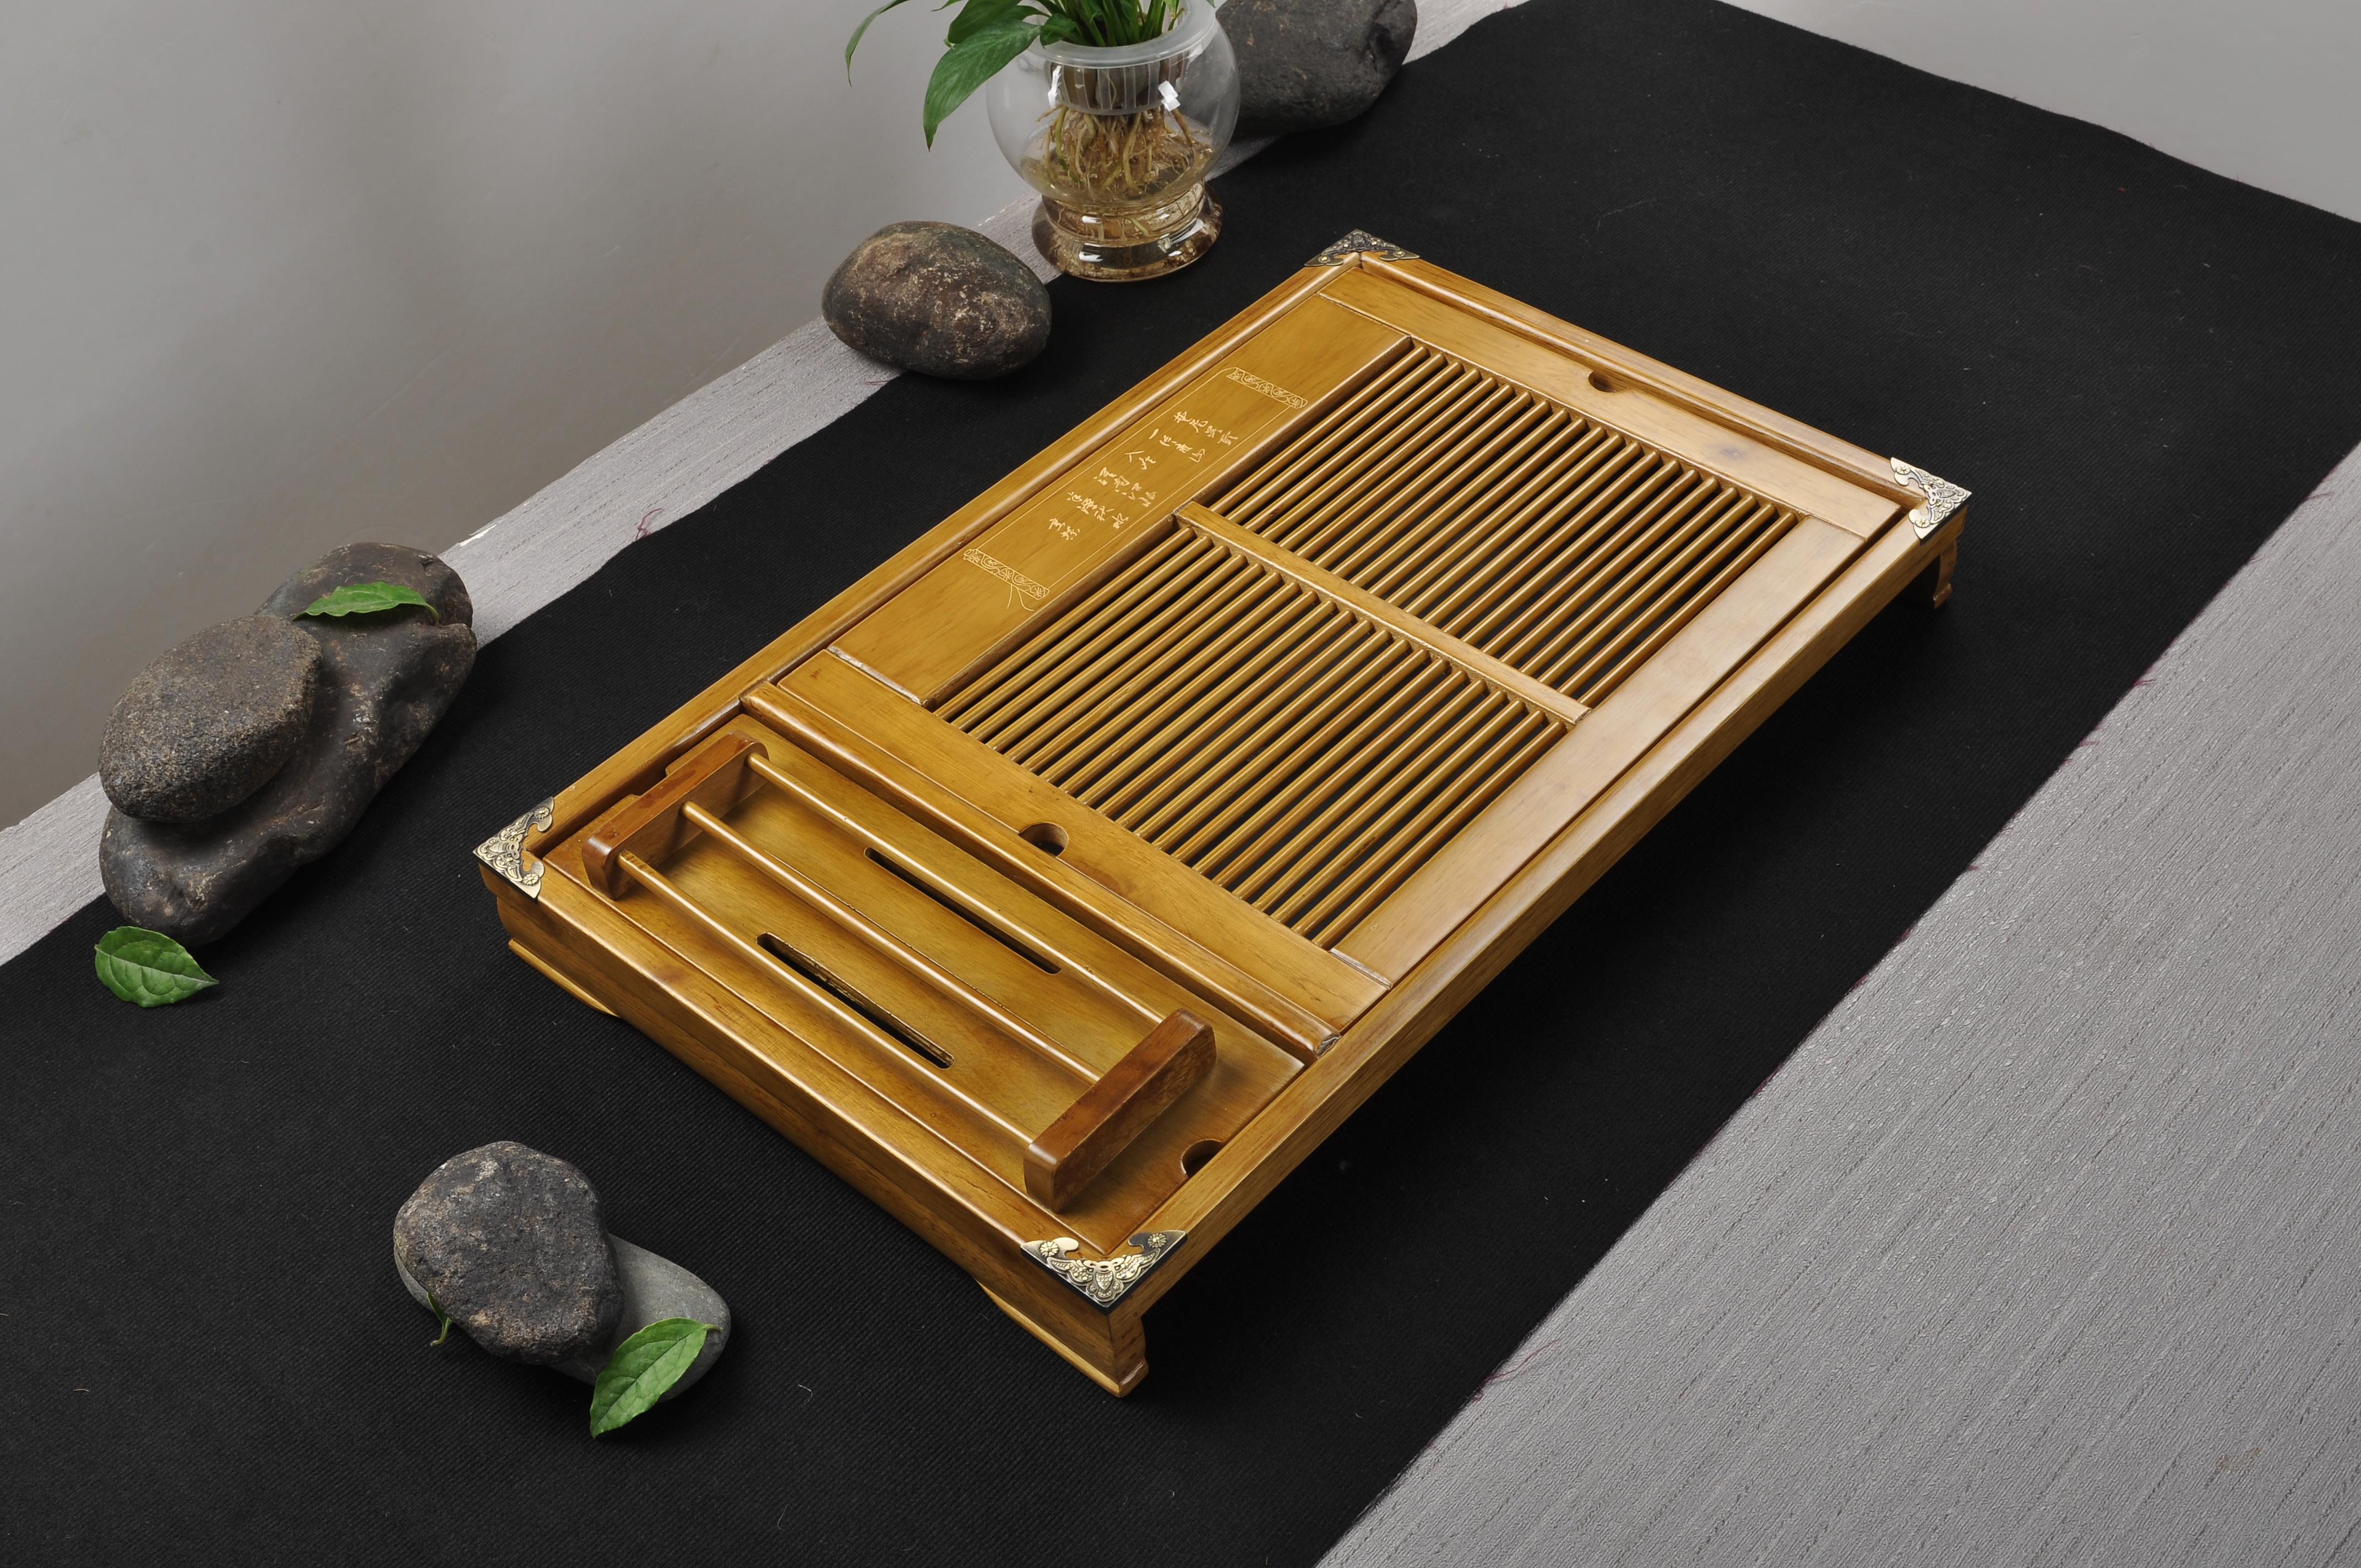 Chinese Tea Trays Gong Fu Tea Tray Good Tea Resource